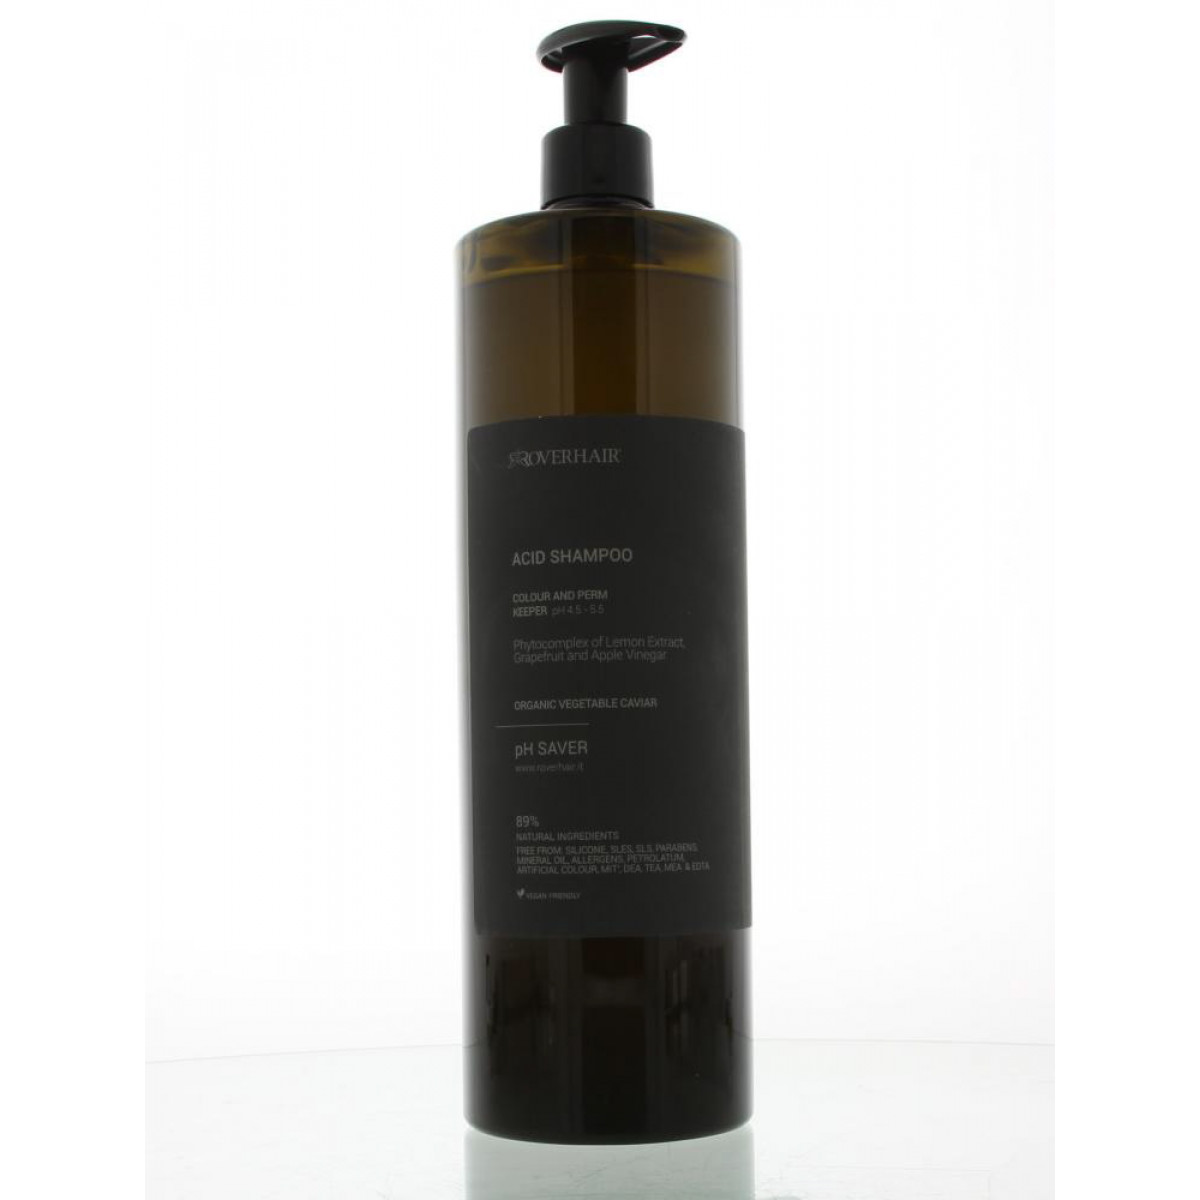 Roverhair pH Saver Acid Shampoo Gekleurd Haar Image